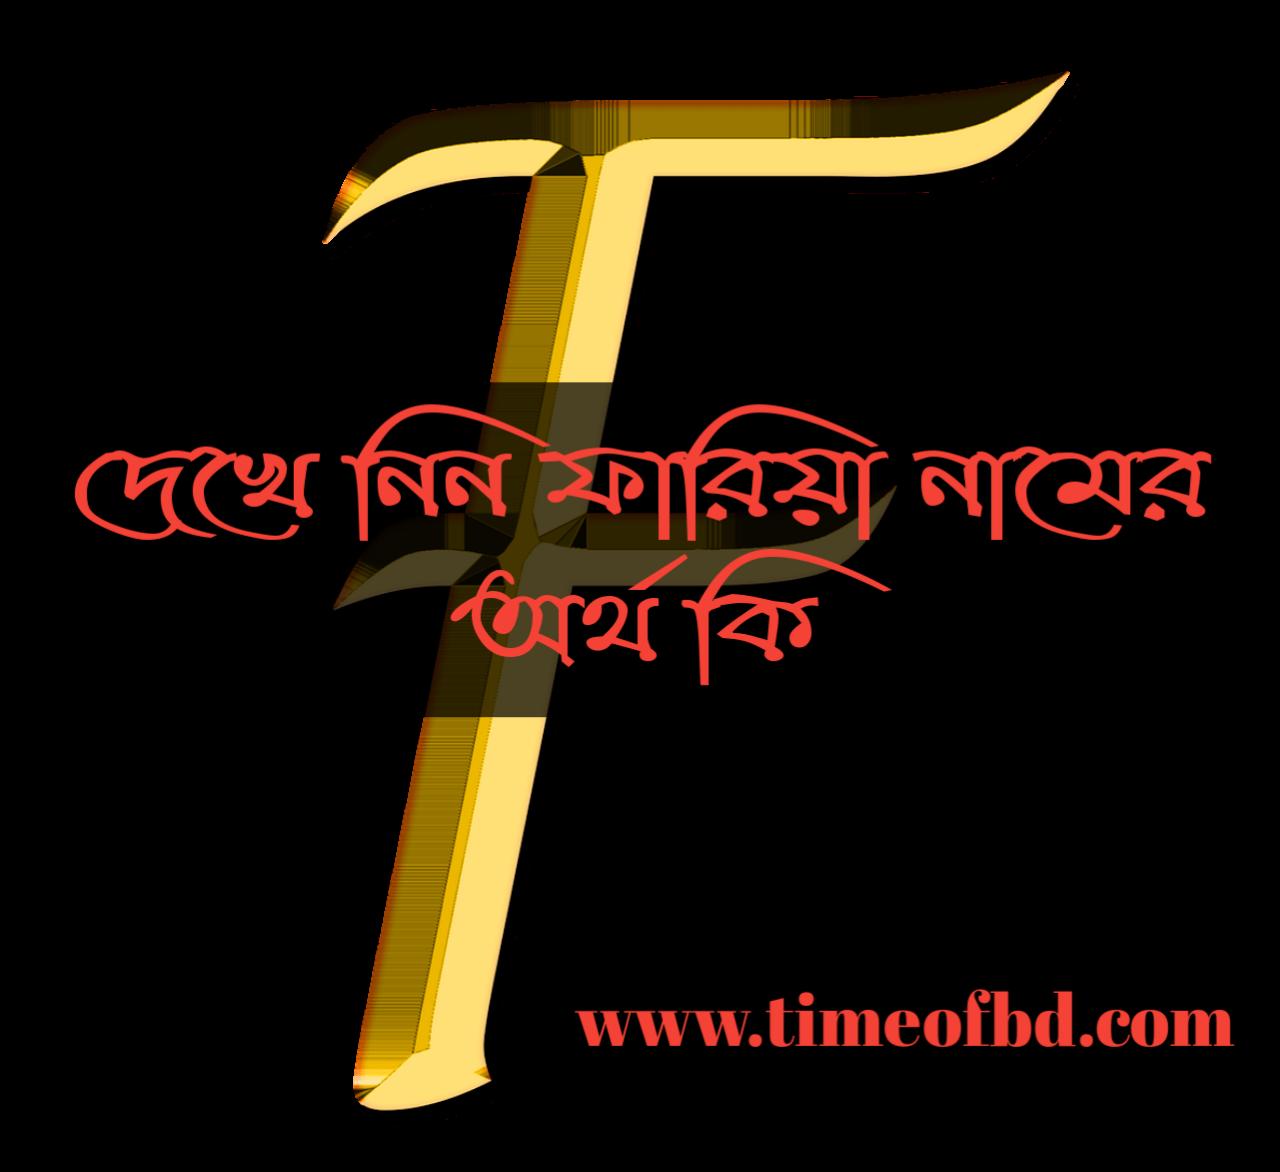 fariya name meaning in Bengali, ফারিয়া নামের অর্থ কি, ফারিয়া নামের বাংলা অর্থ কি, ফারিয়া নামের ইসলামিক অর্থ কি,